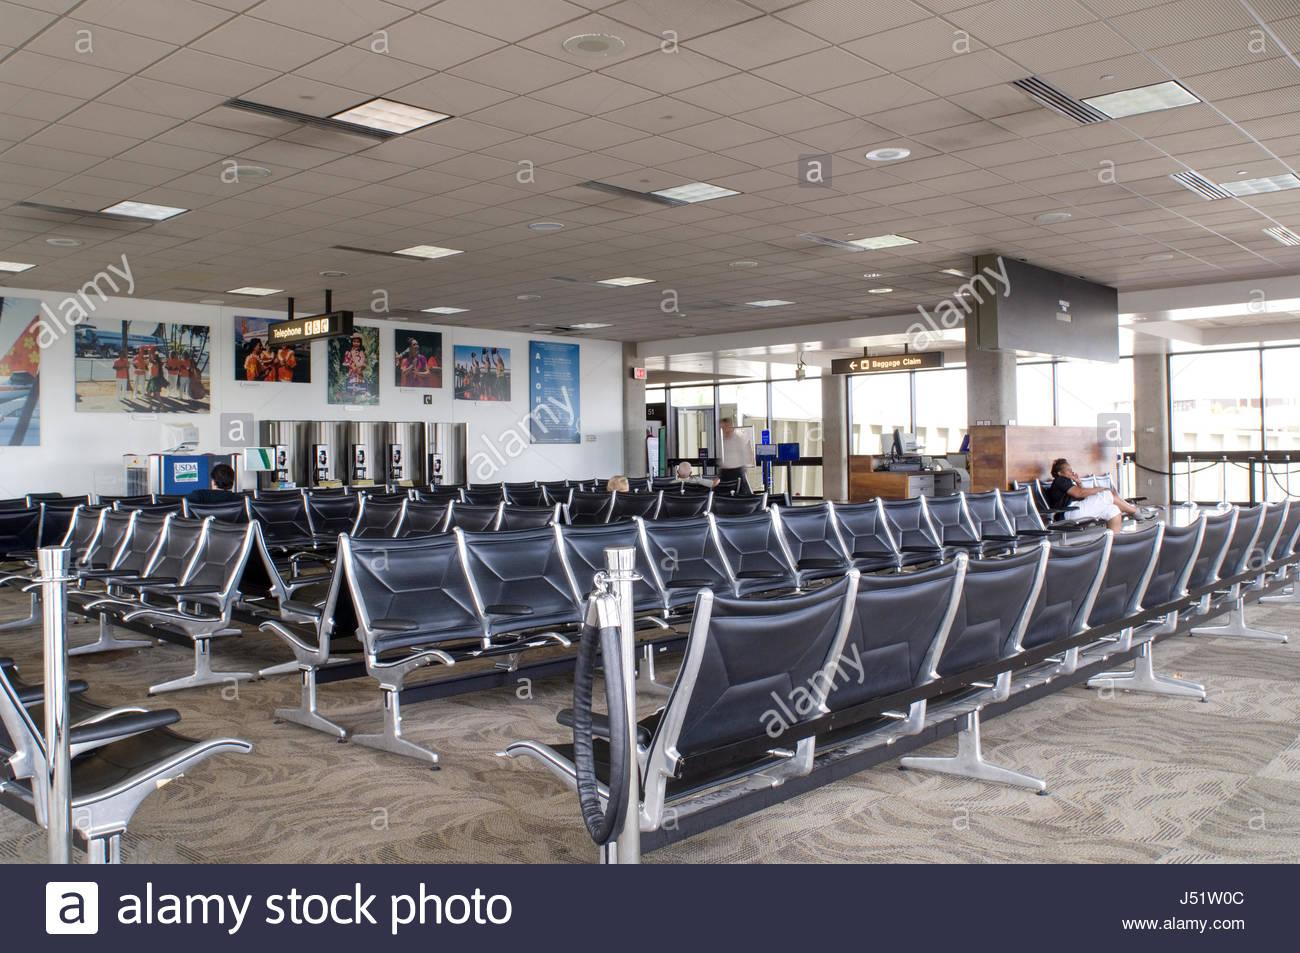 Honolulu International Airport Interisland Terminal, Honolulu, Oahu,  Hawaii, USA. As The Major Aviation Gateway For The State Of Hawaii HNL Is  The Pri